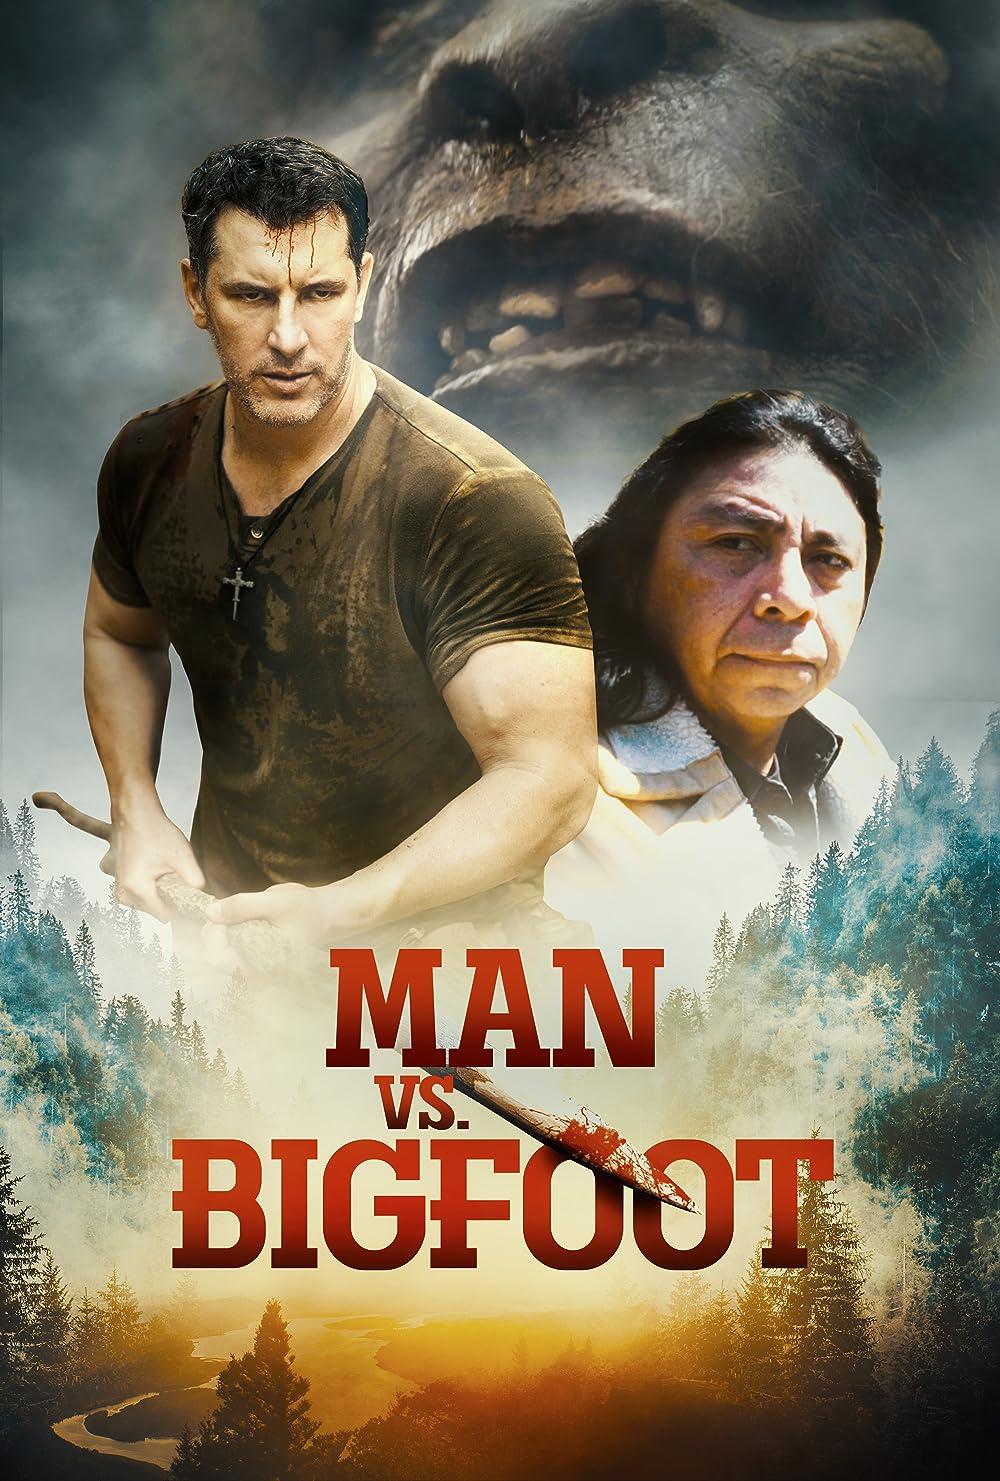 Download Man vs Bigfoot (2021) Bengali Dubbed (Voice Over) WEBRip 720p [Full Movie] 1XBET FREE on 1XCinema.com & KatMovieHD.sk